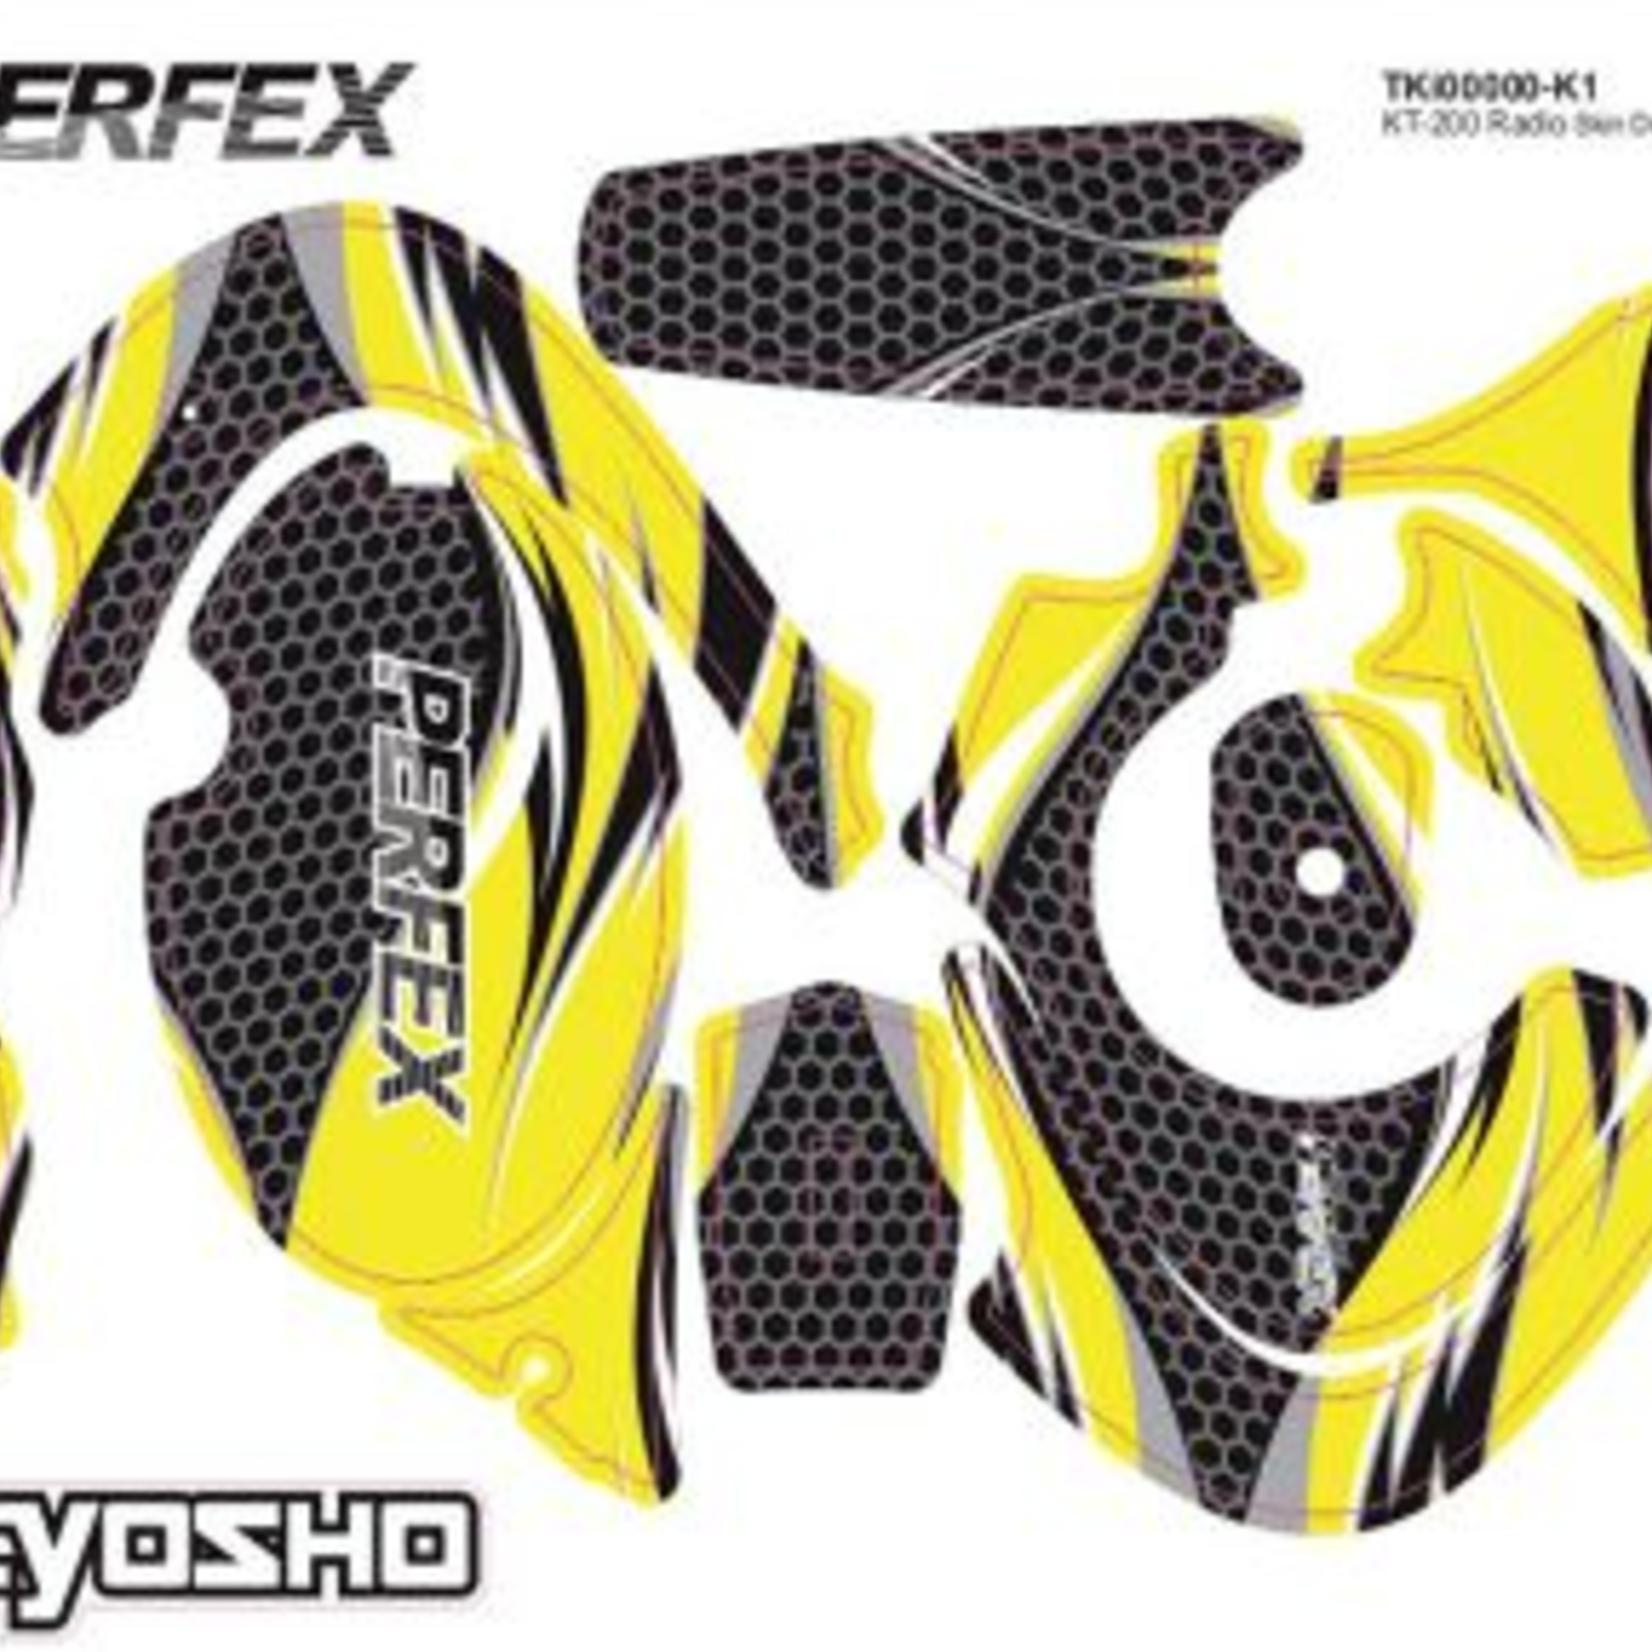 Kyosho KYO36270 Kyosho Radio Skins Decal (for KT-18)